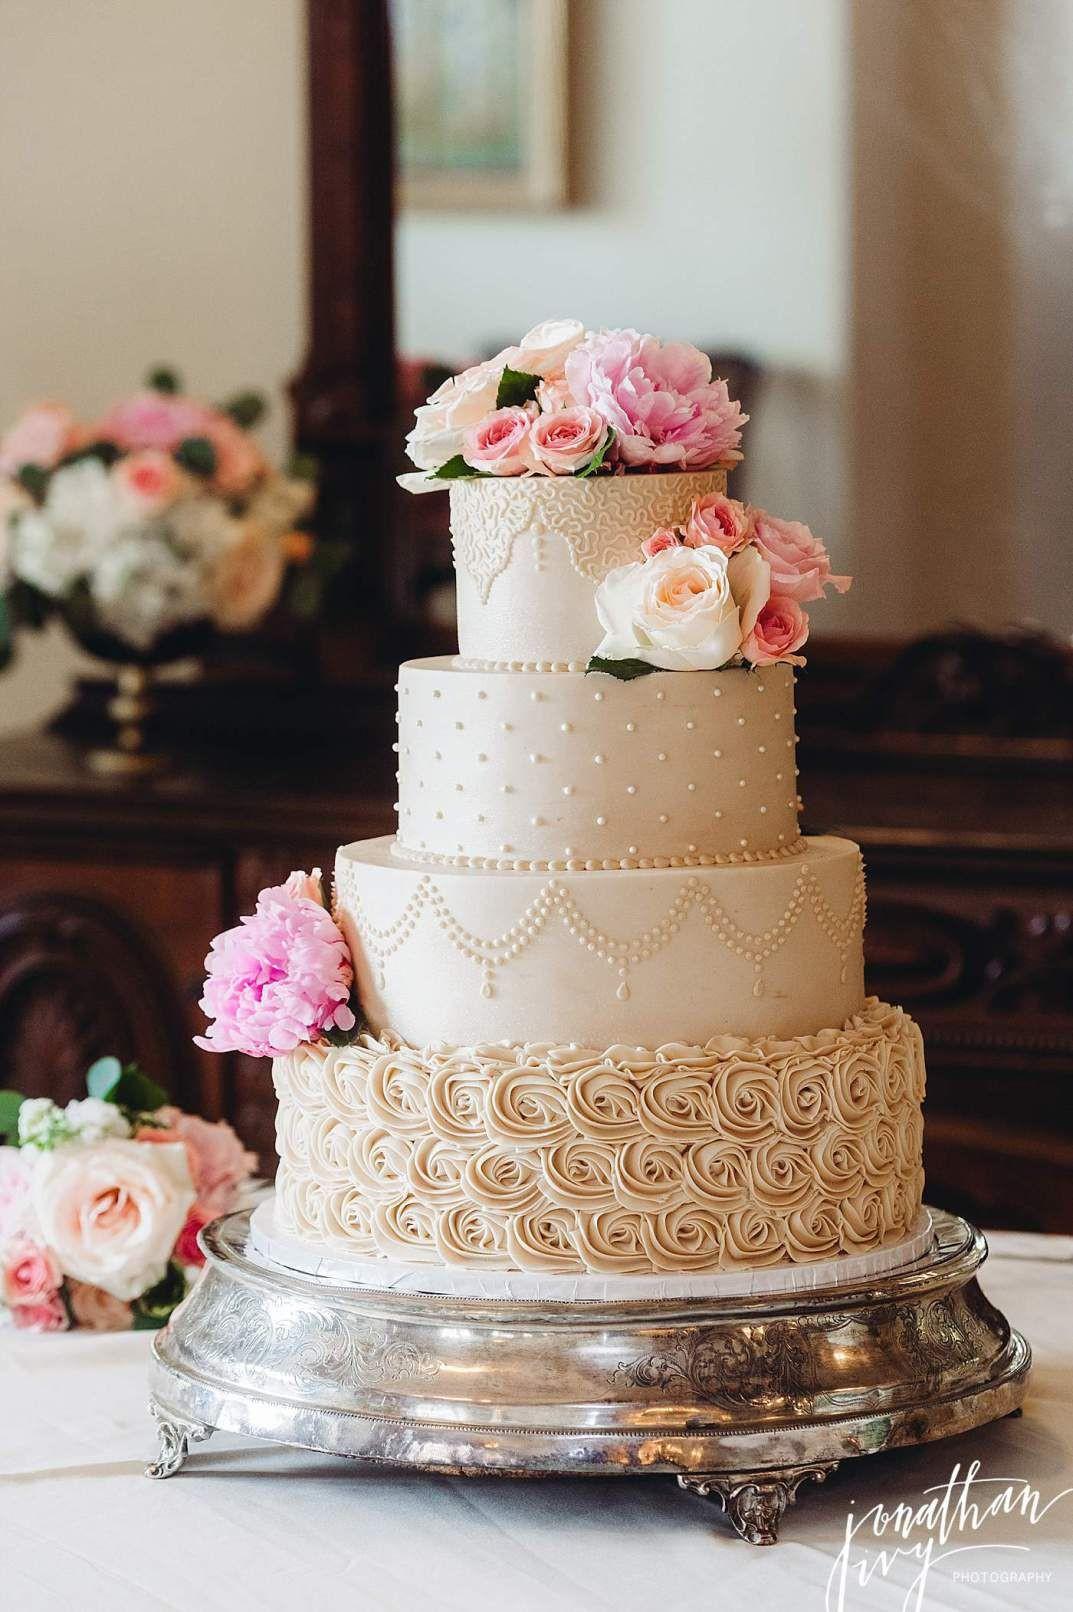 Tiered Wedding Cakes  Beautiful beige 4 tier buttercream wedding cake